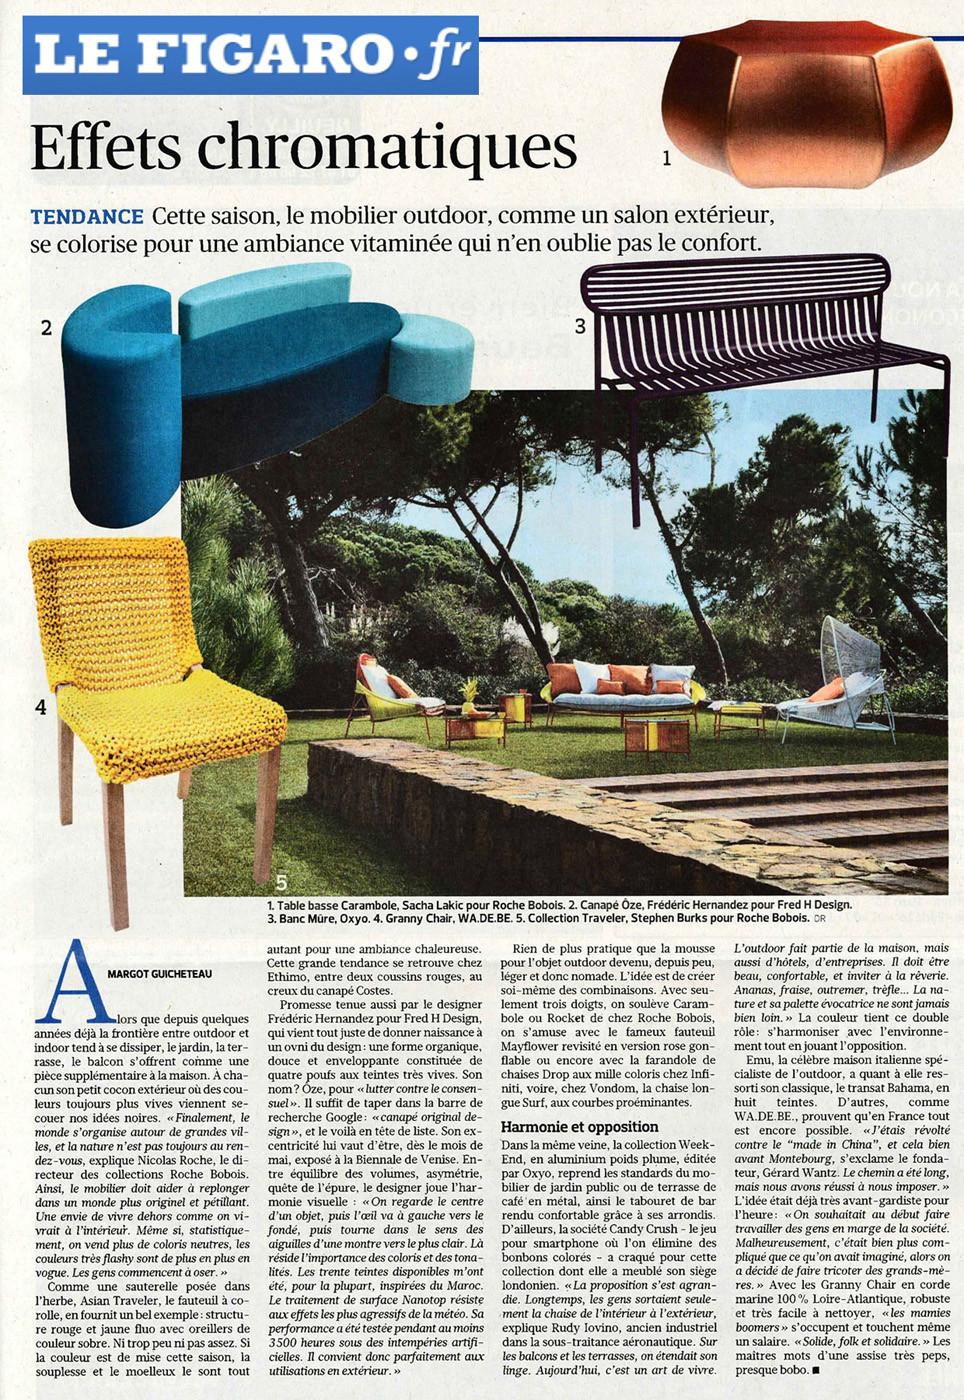 Le Figaro Parution Canapé Ôze By Fred Hernandez